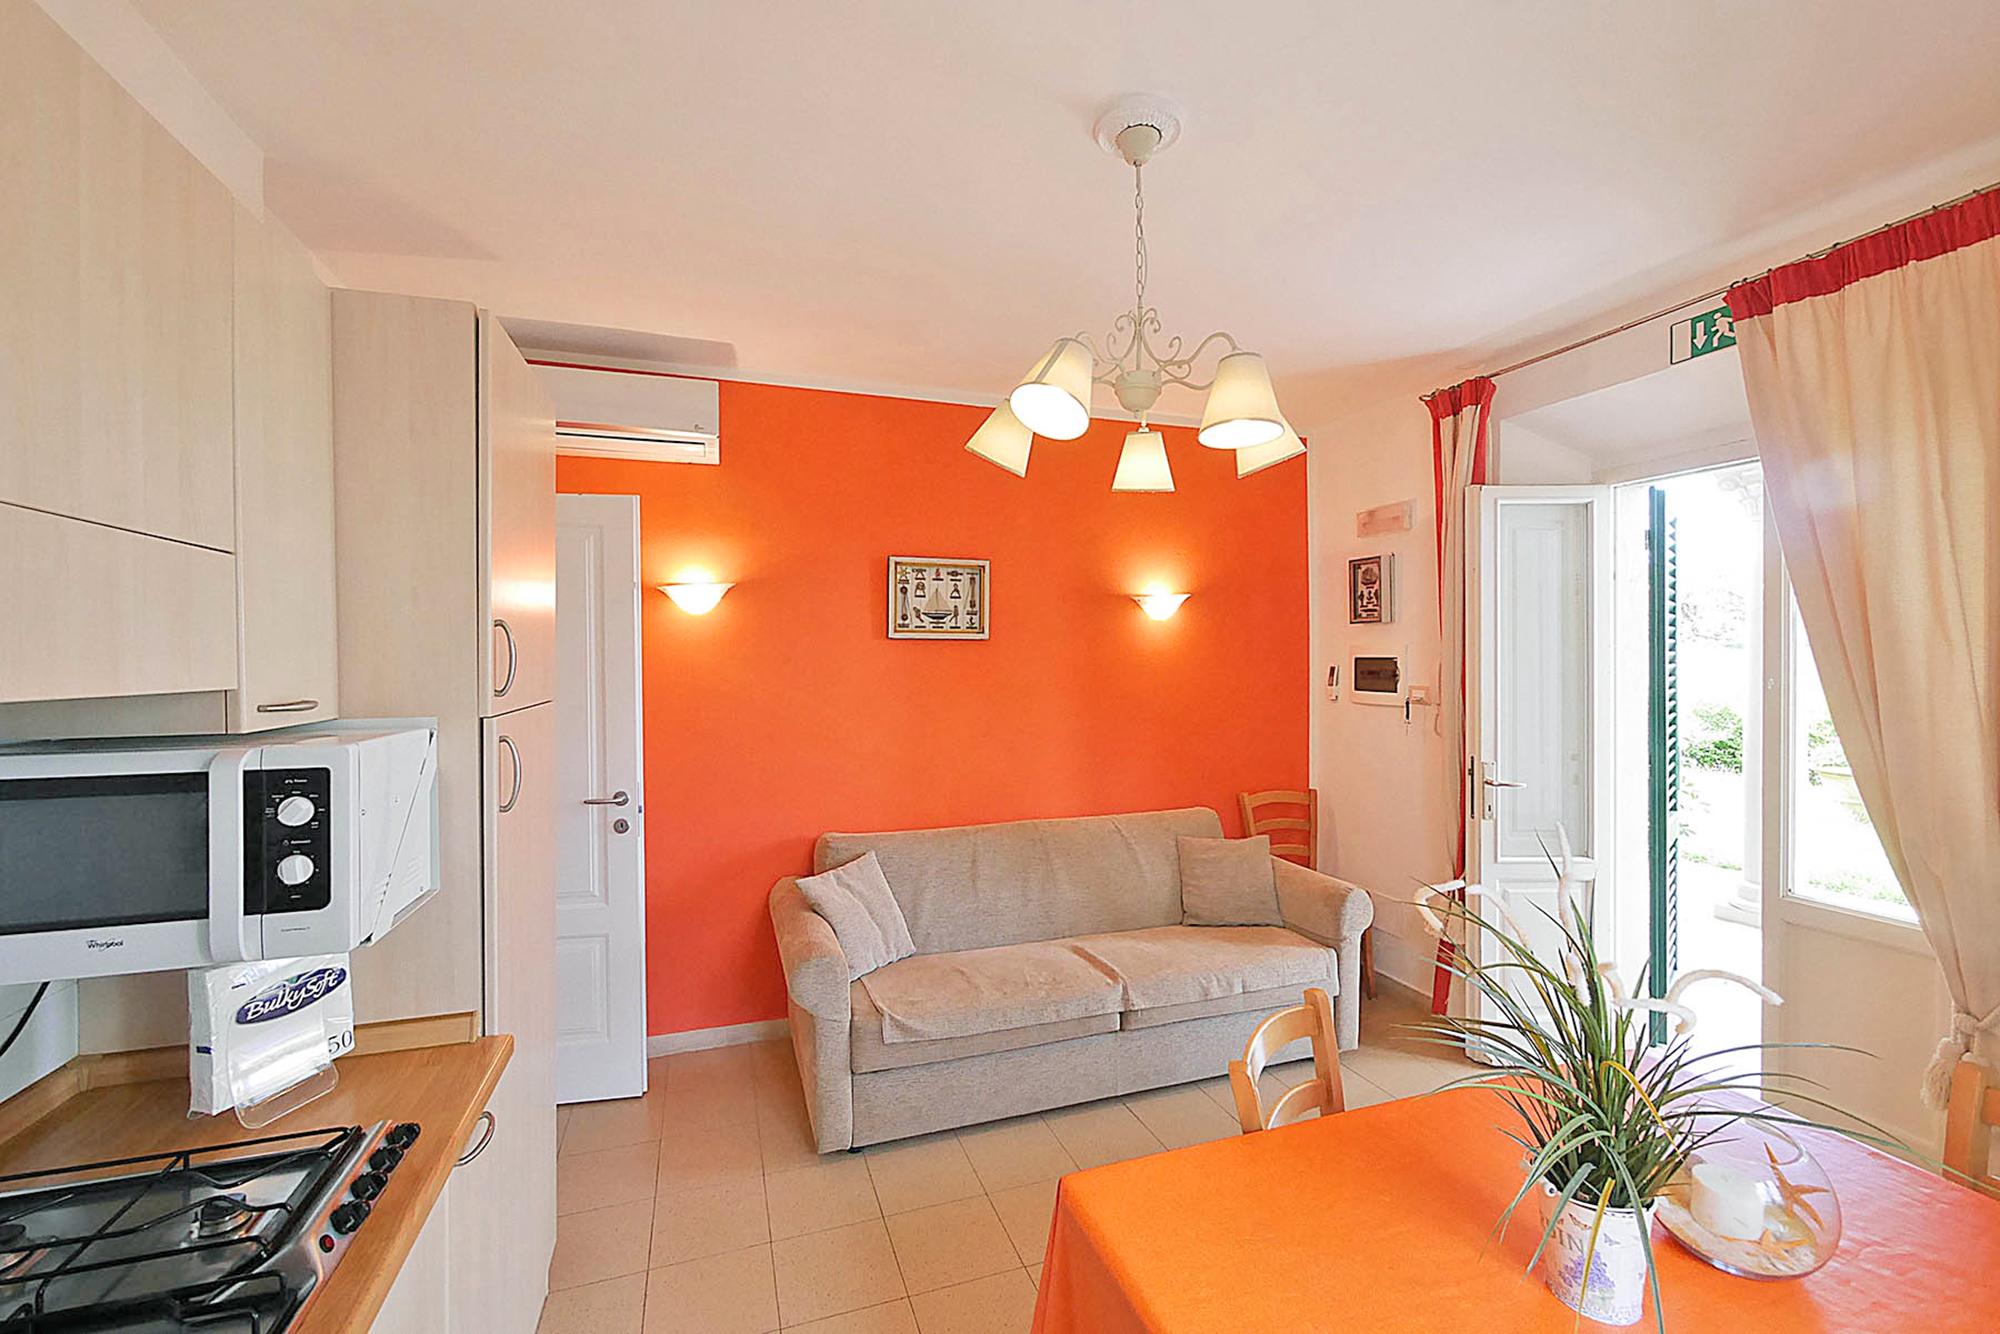 Appartamento-Mare-Toscana-2